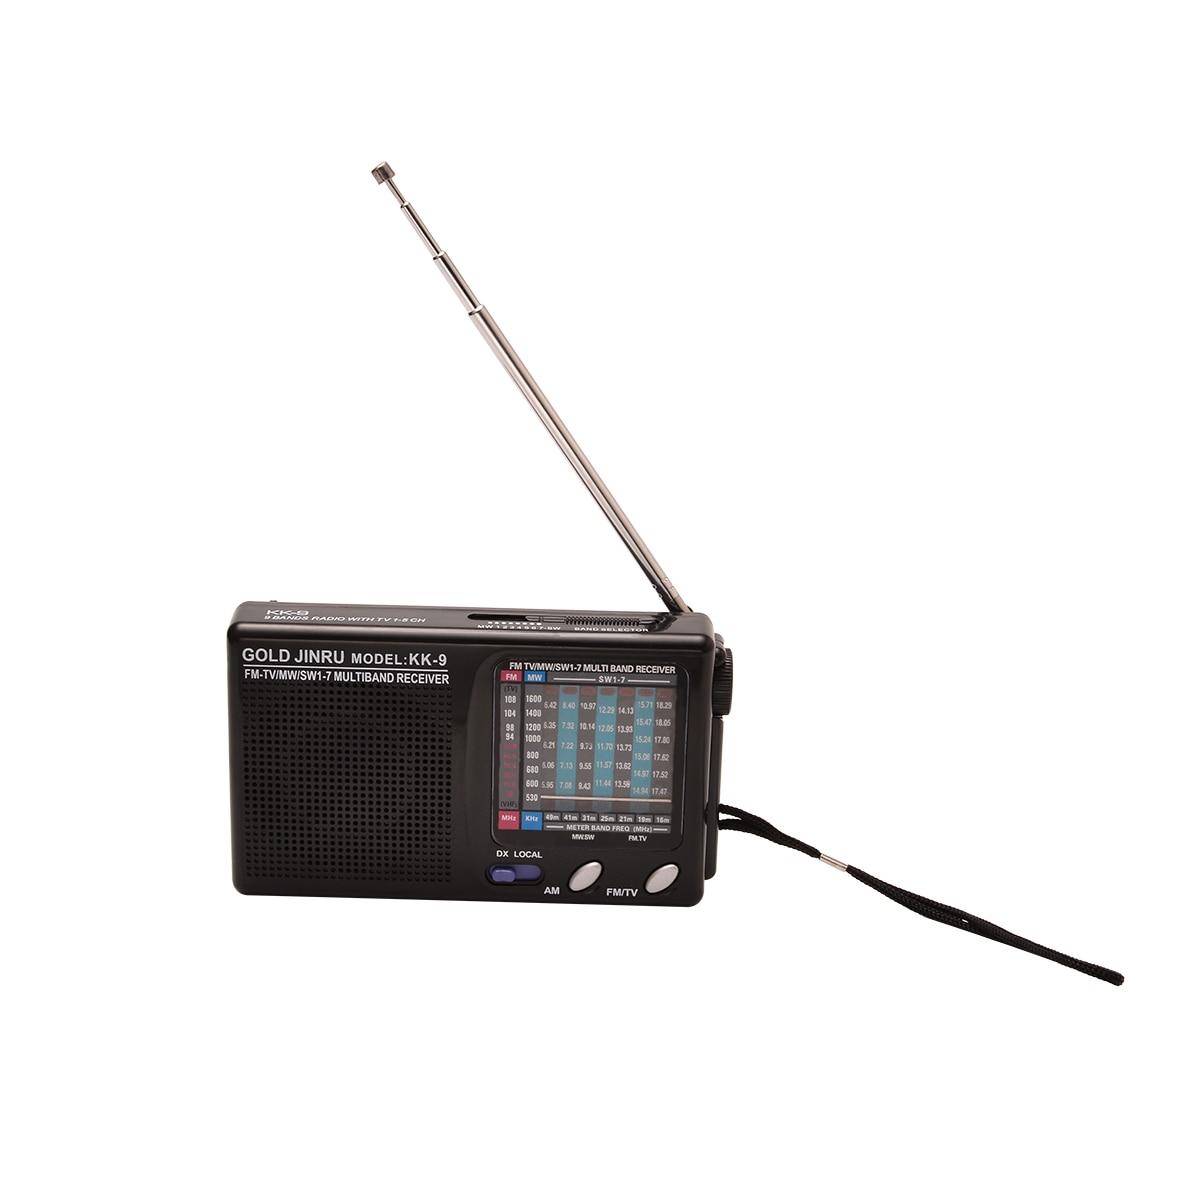 1 stück Tragbare Full Band Radio Professional Welt Band Radio Receiver Unterstützt DSP AM/FM/MW/SW stereo Mayitr